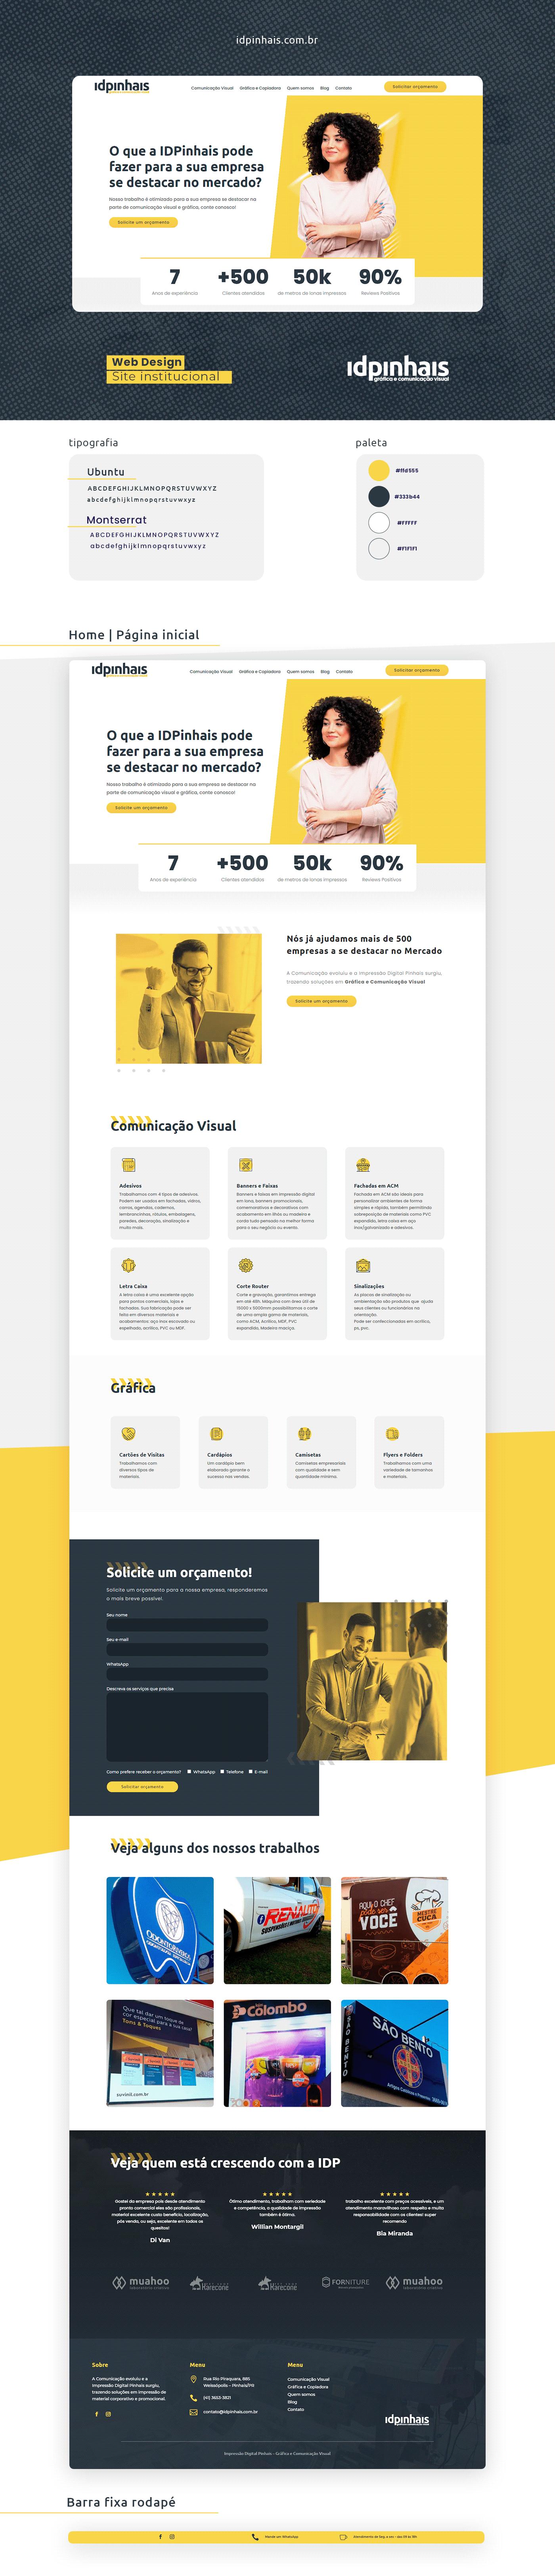 design marketing   mobile ui design UI/UX ux Web Design  Website wordpress xD